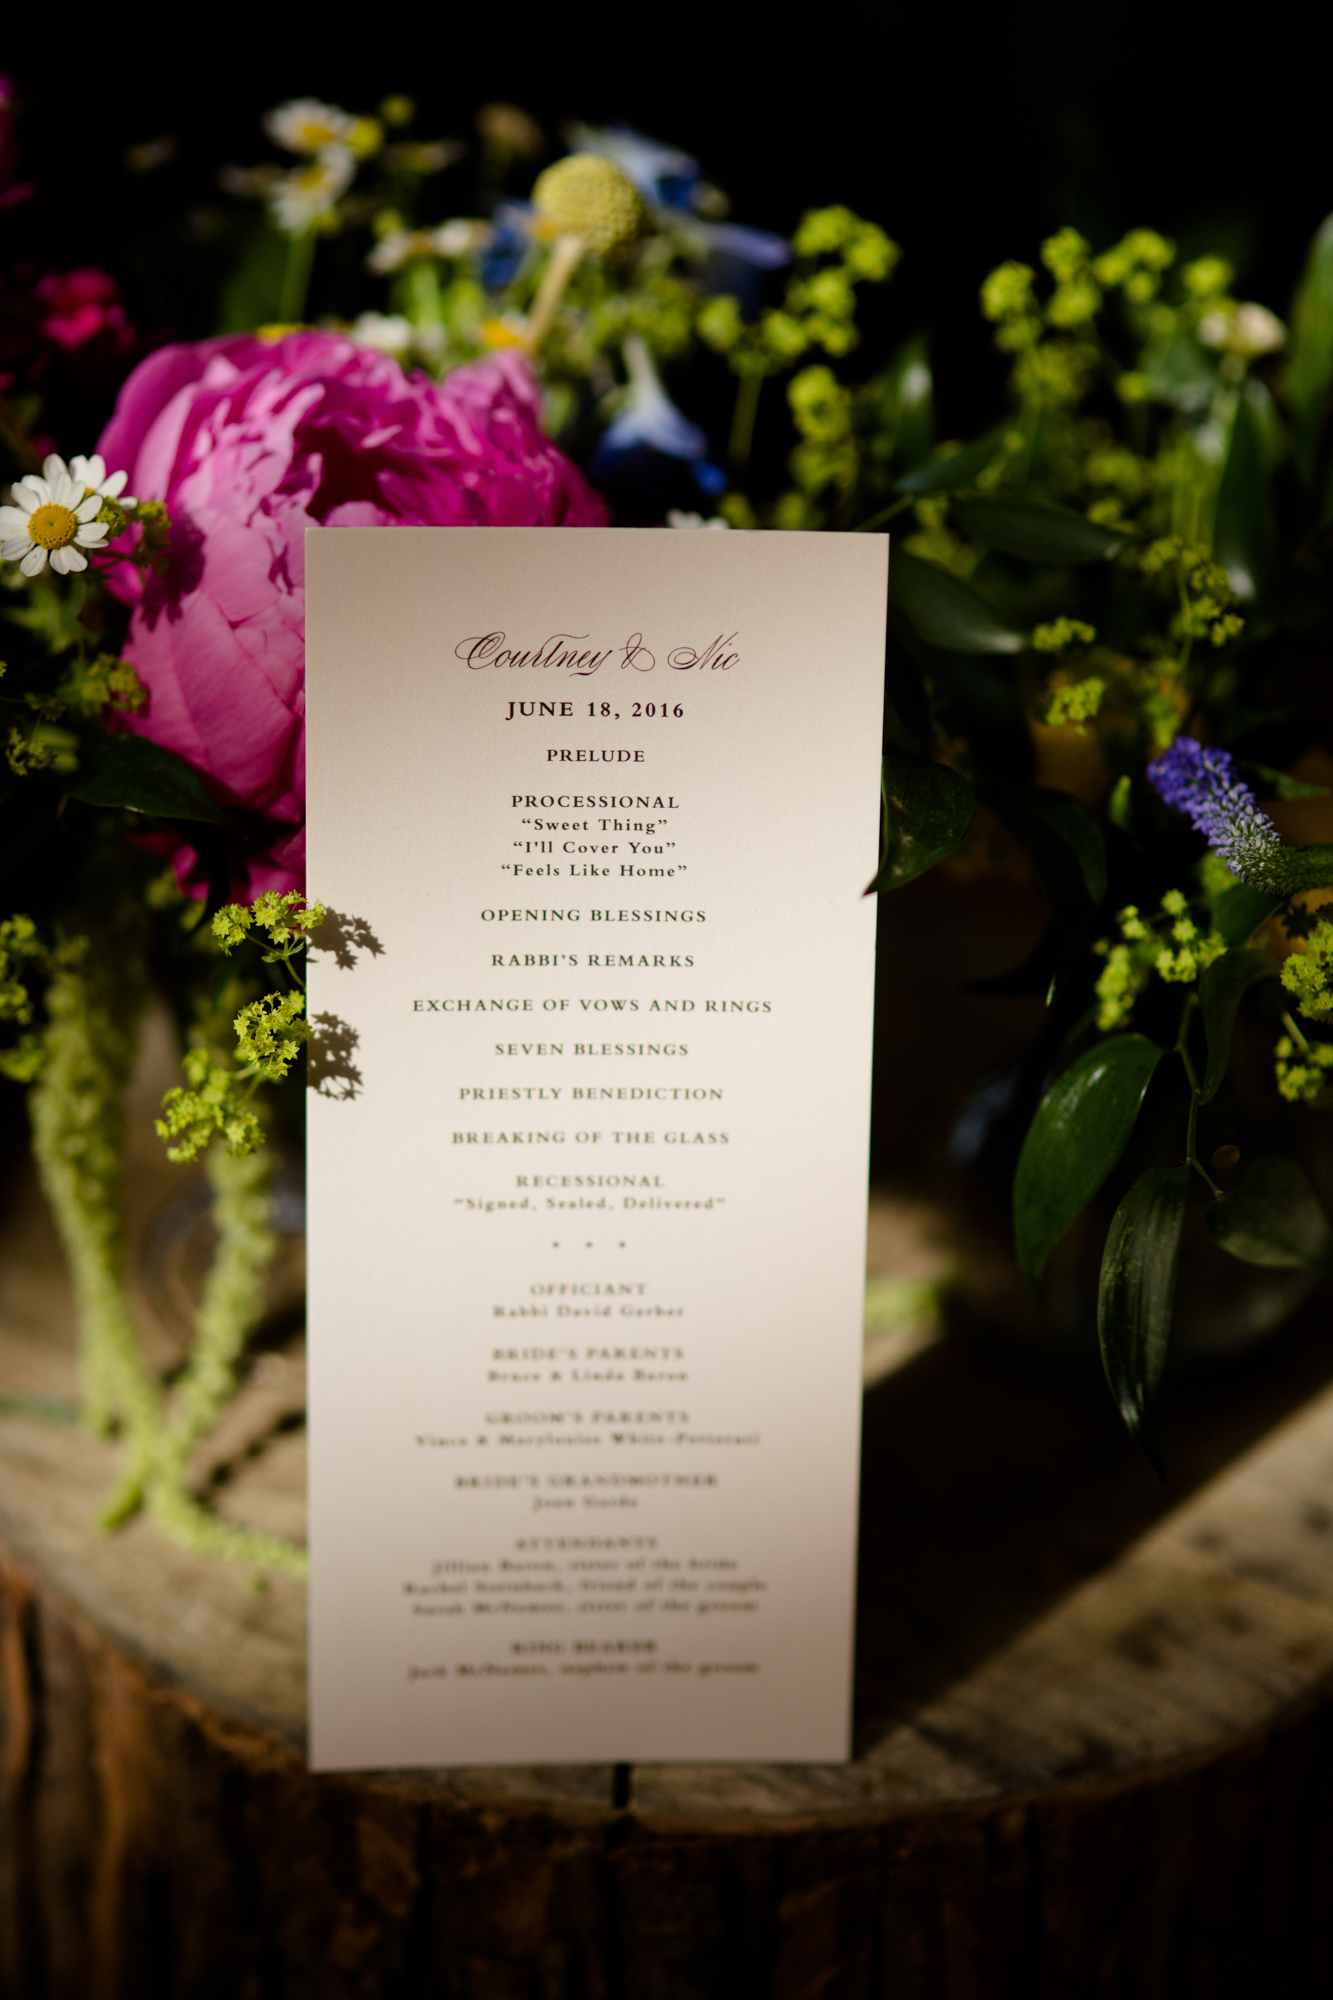 Wedding ceremony program at Bridgeport Art Center in Chicago